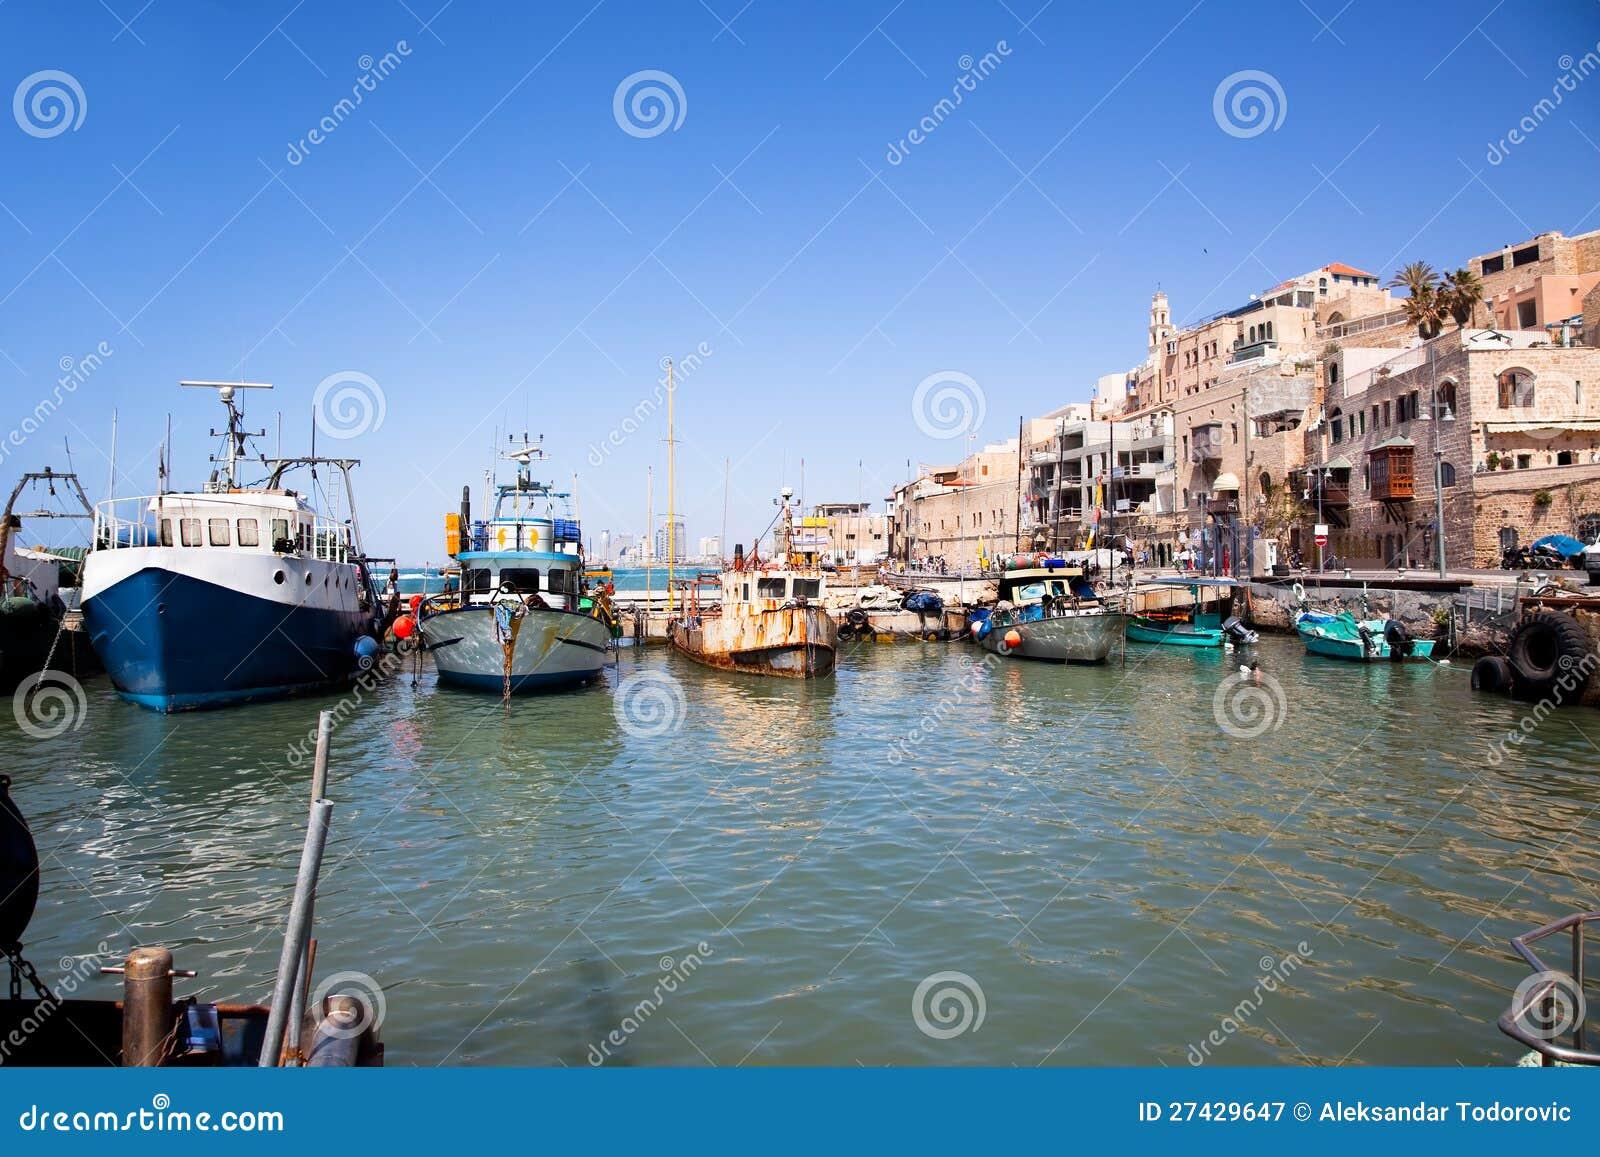 De oude haven van Jaffa. Tel Aviv, Israël